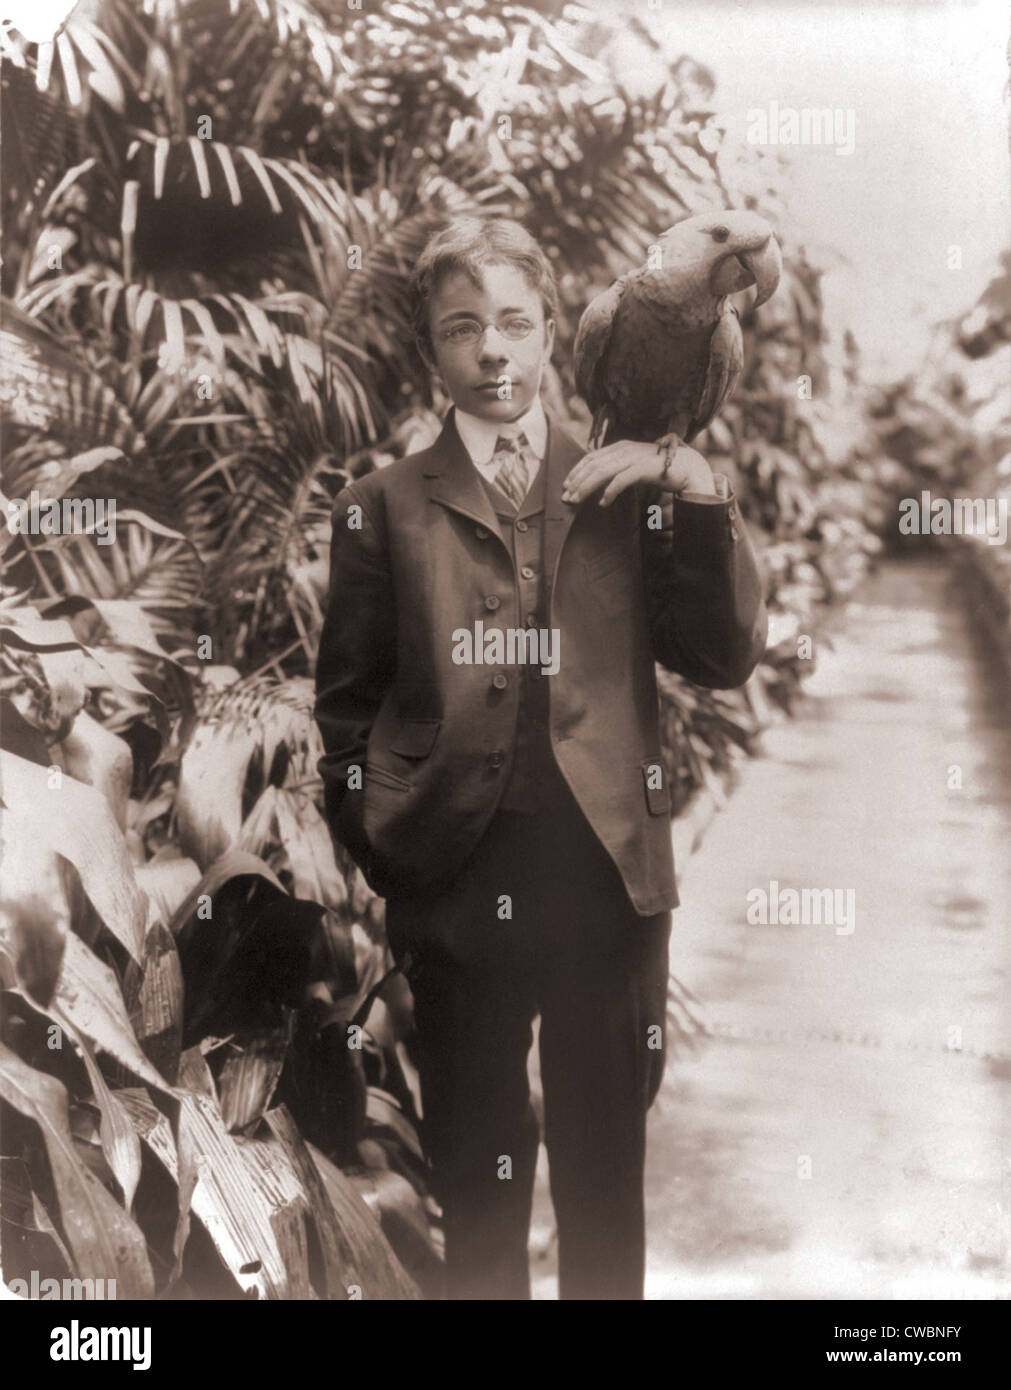 Theodore Roosevelt, Jr., mit blau-Ara Eli Yale benannt. 1902-Foto von Frances. Stockbild